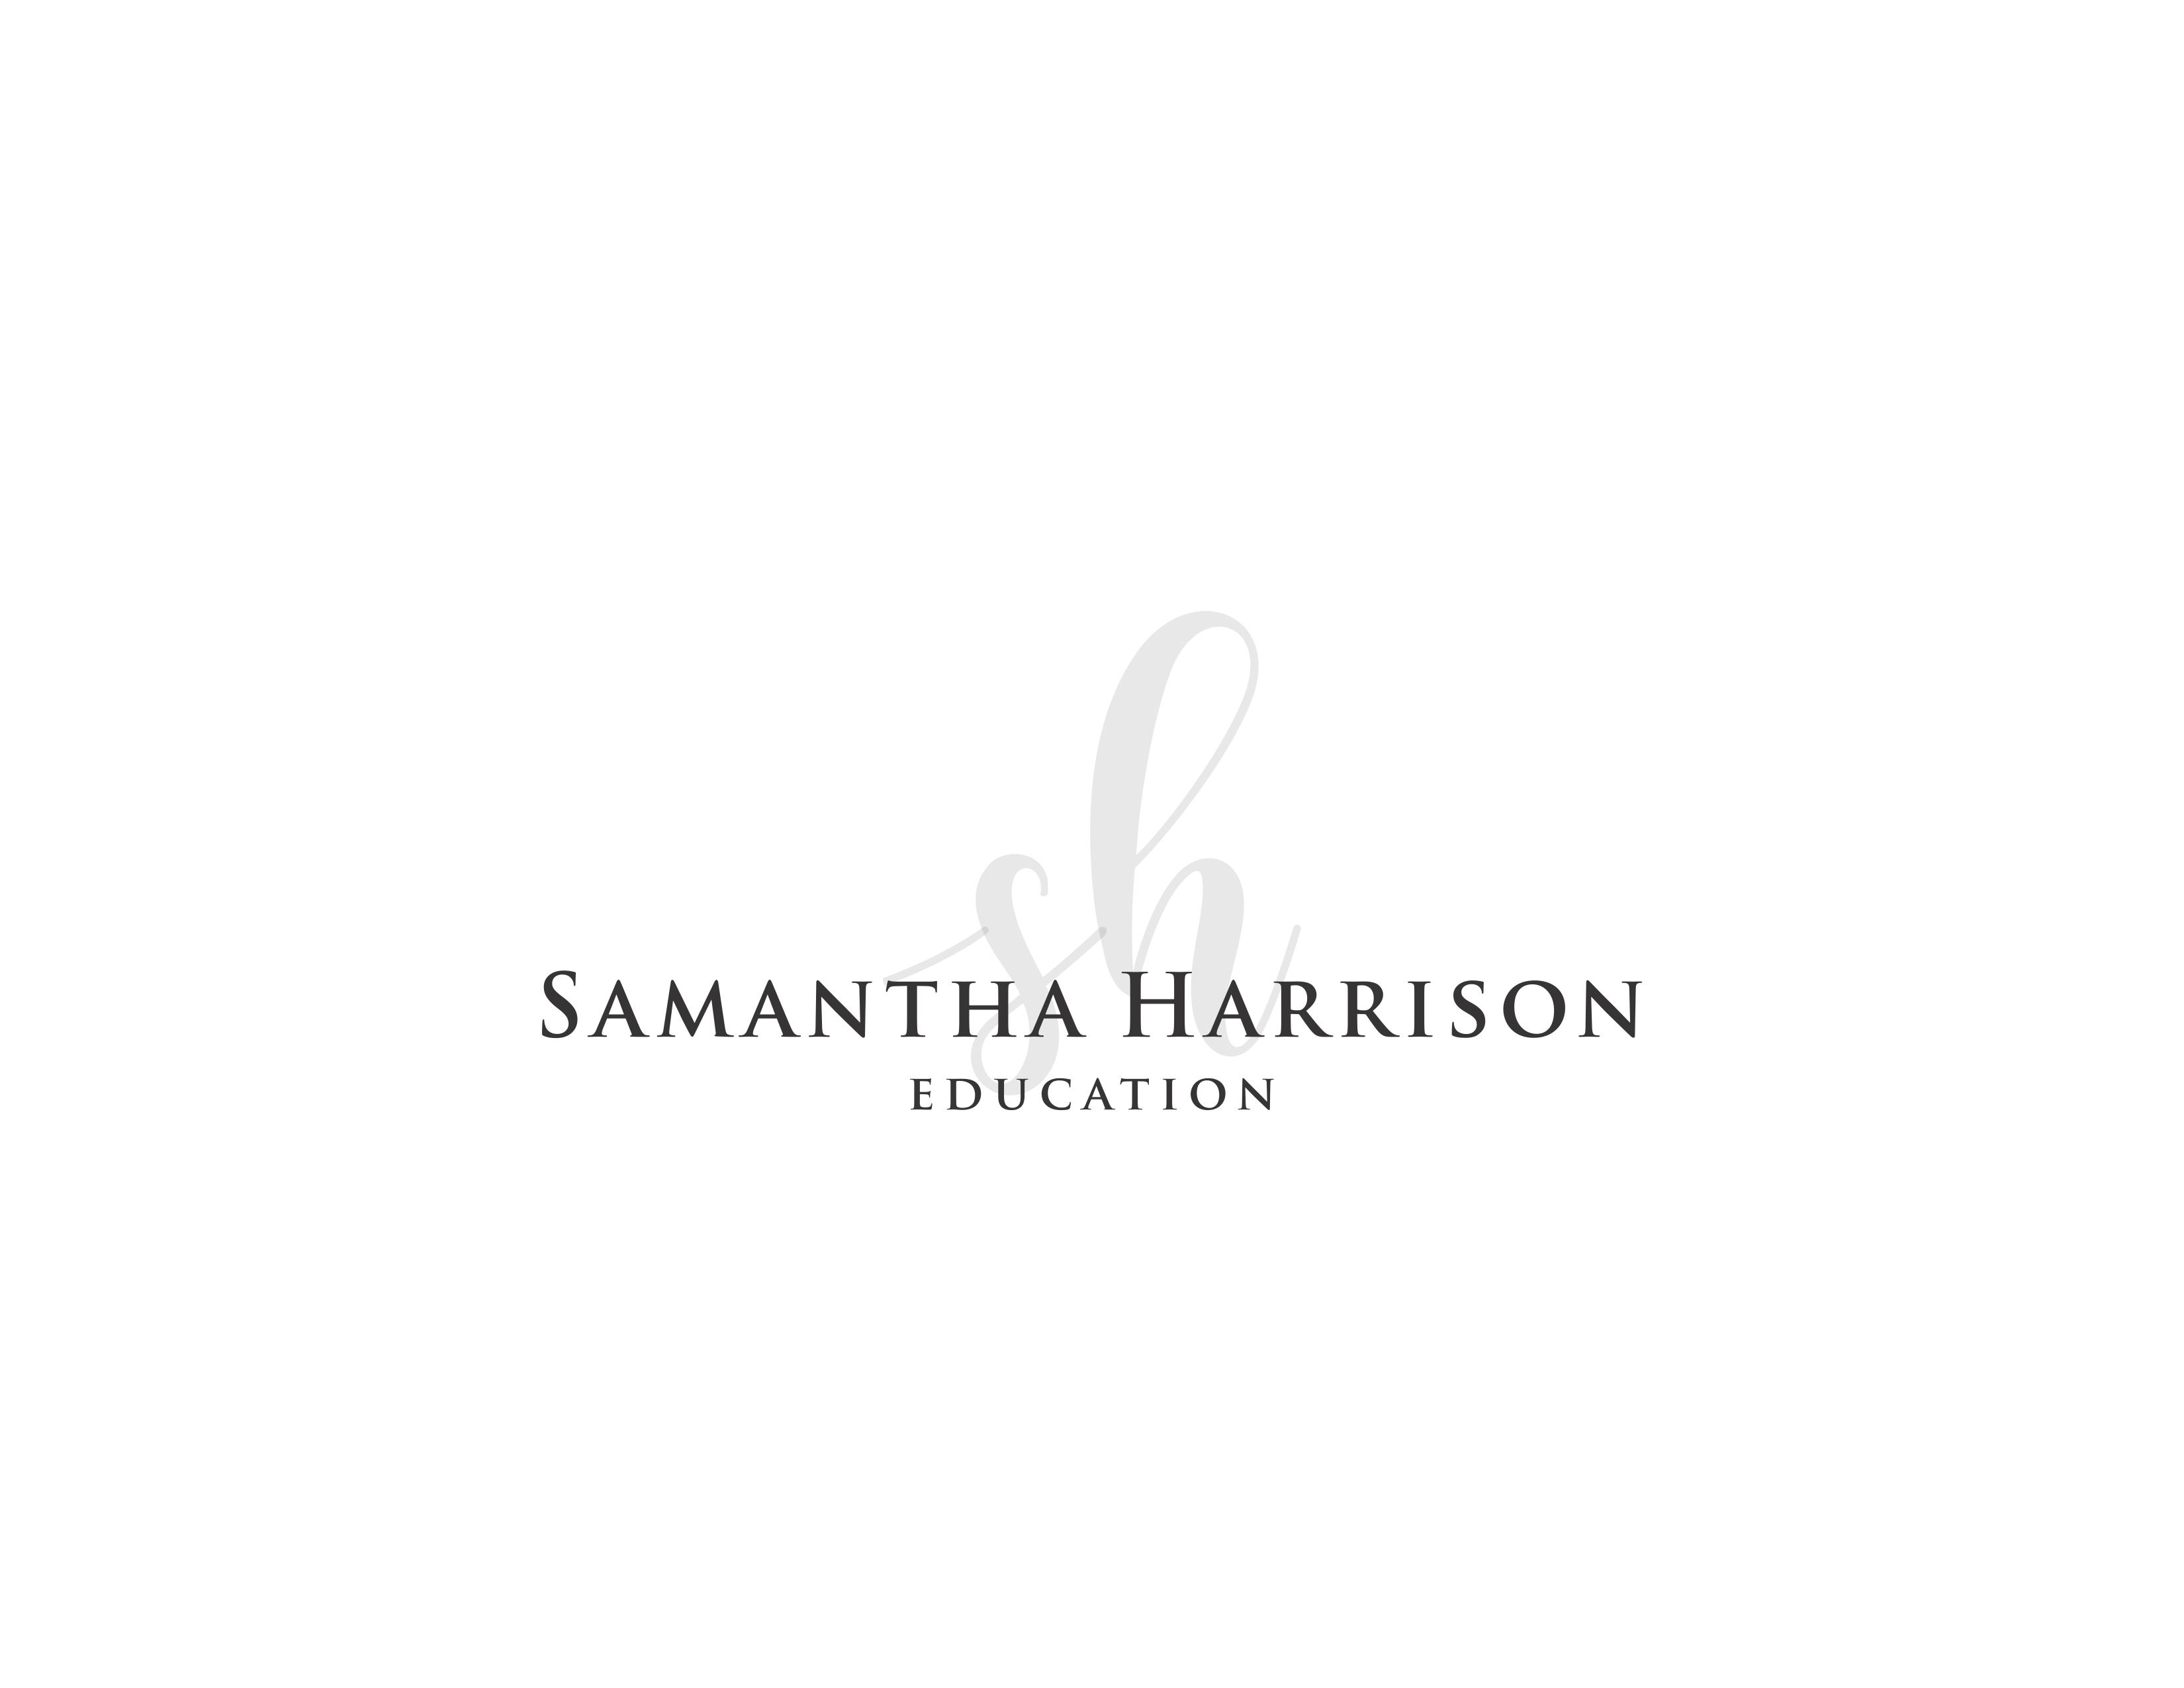 Samantha Harrison Education